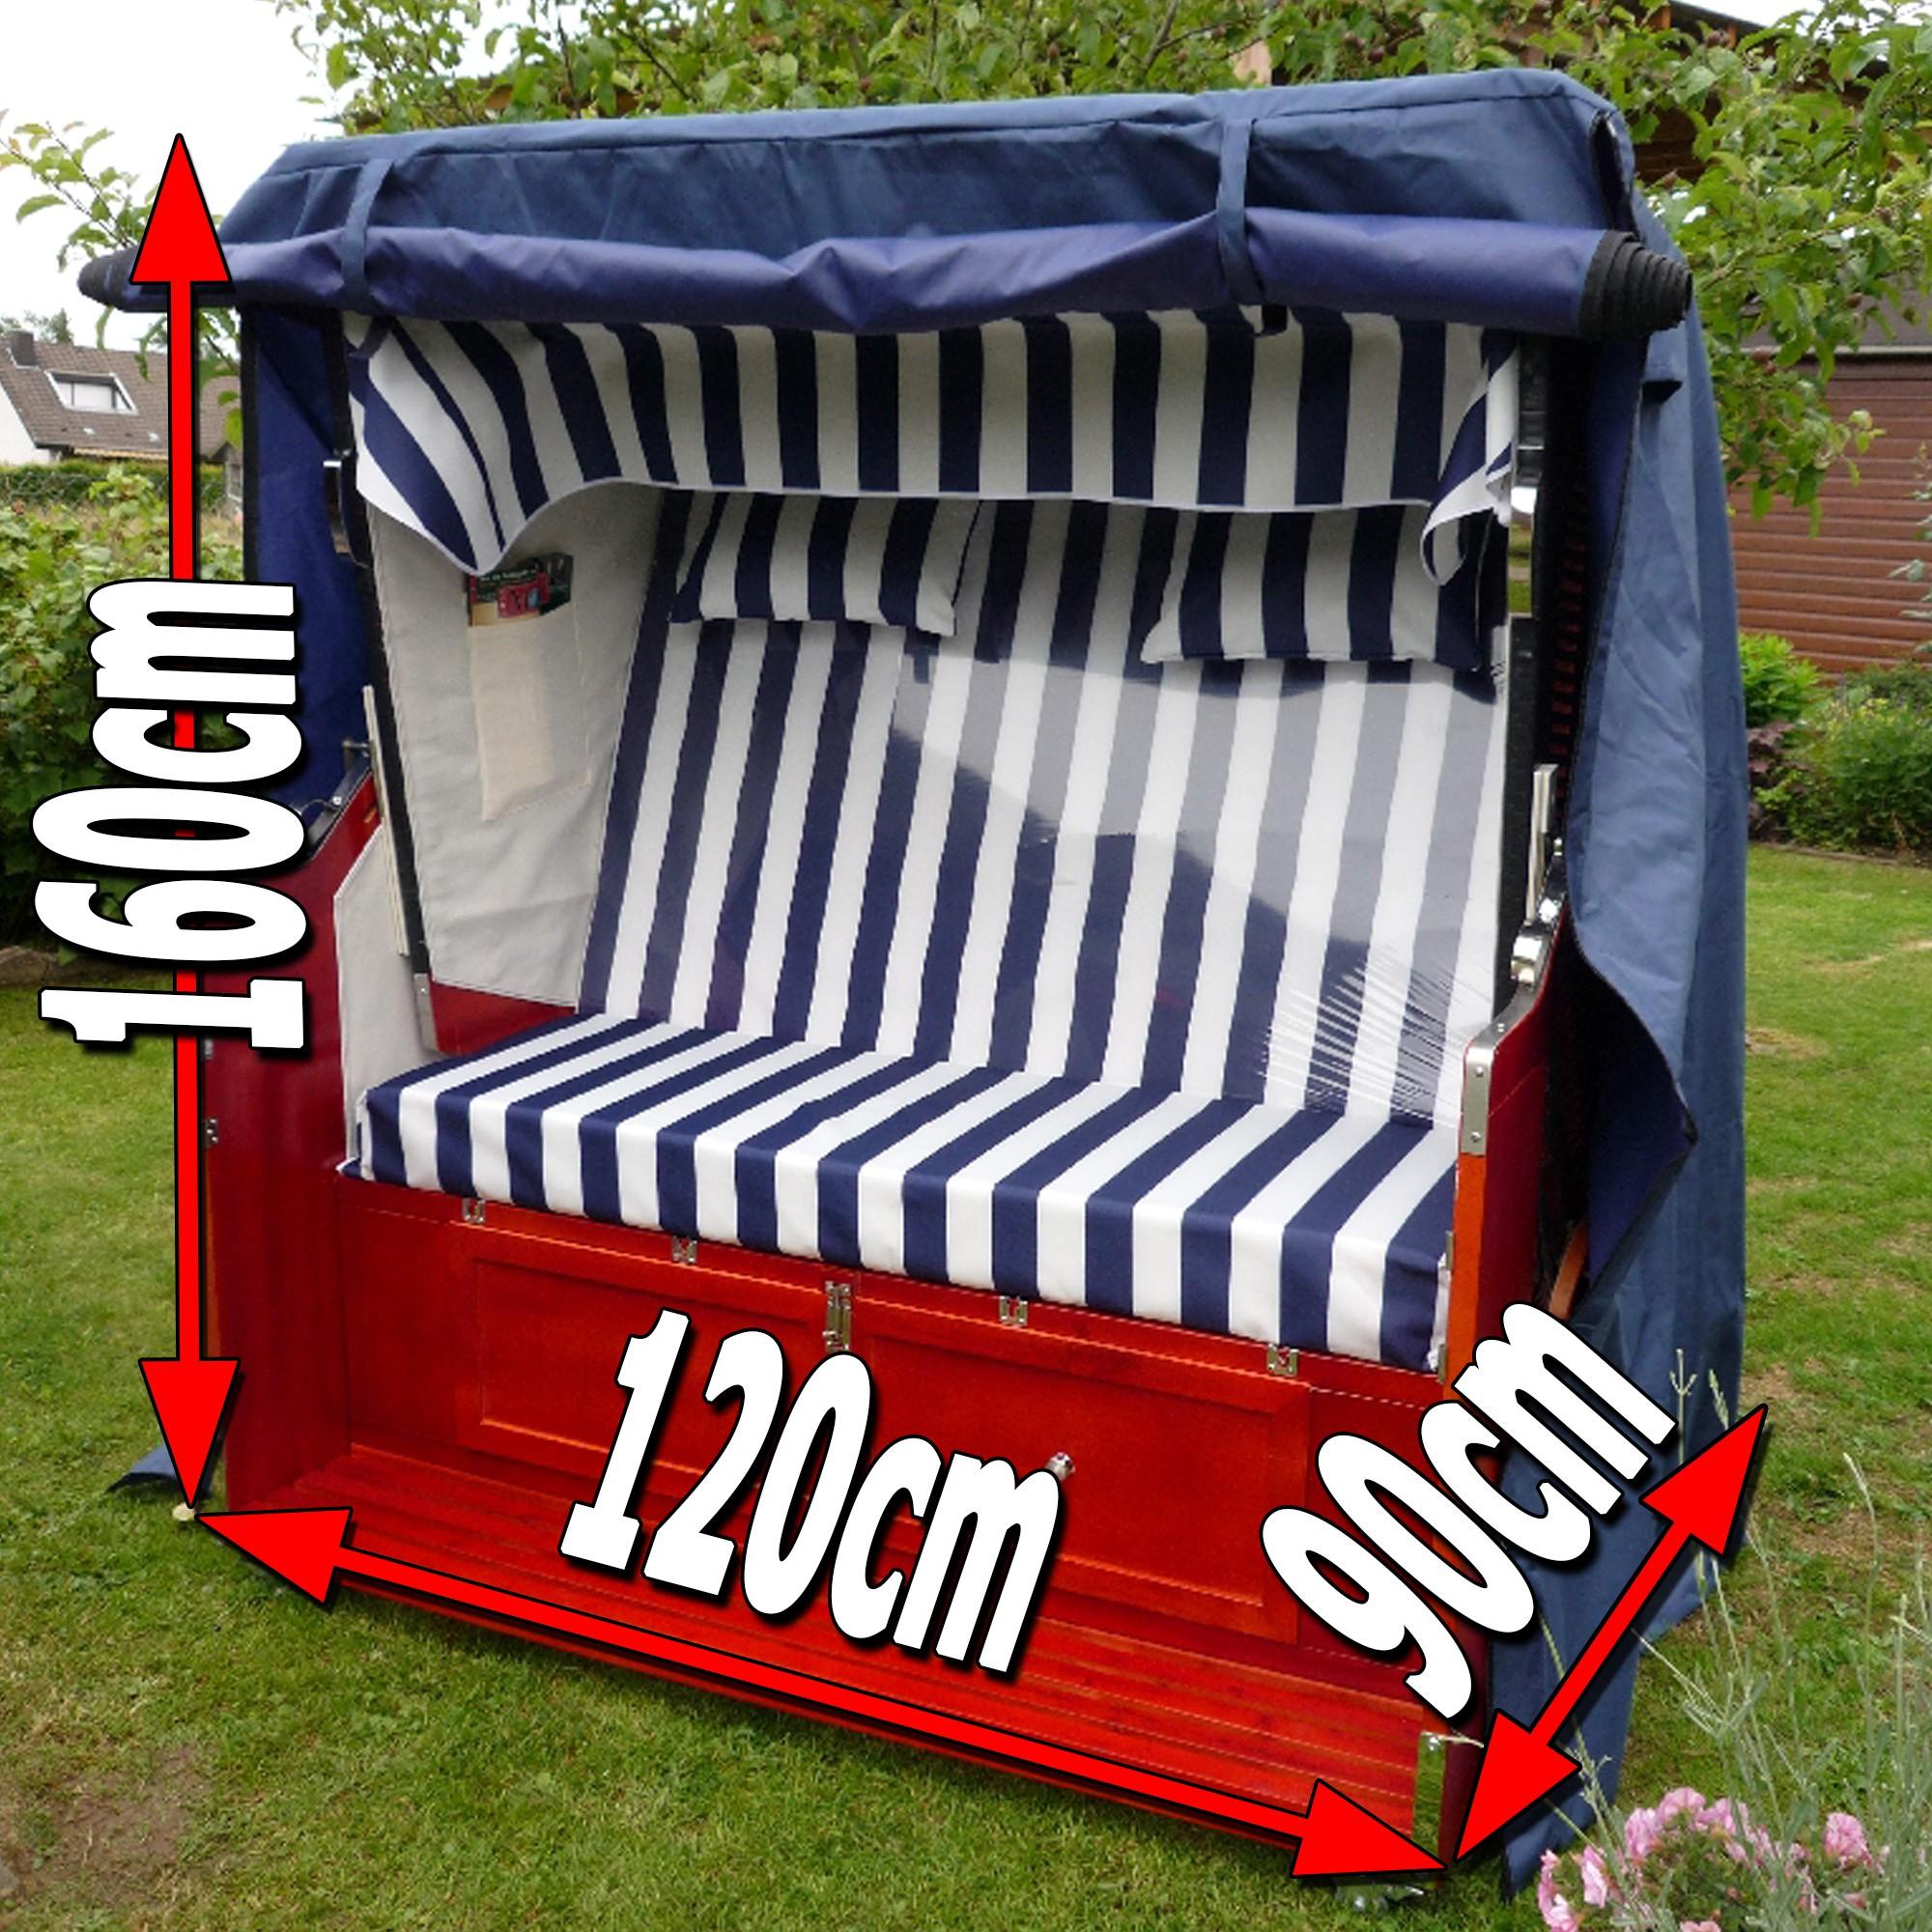 schutzh lle strandkorb winterfest g nstig abdeckhaube f r strandkorb kaufen. Black Bedroom Furniture Sets. Home Design Ideas